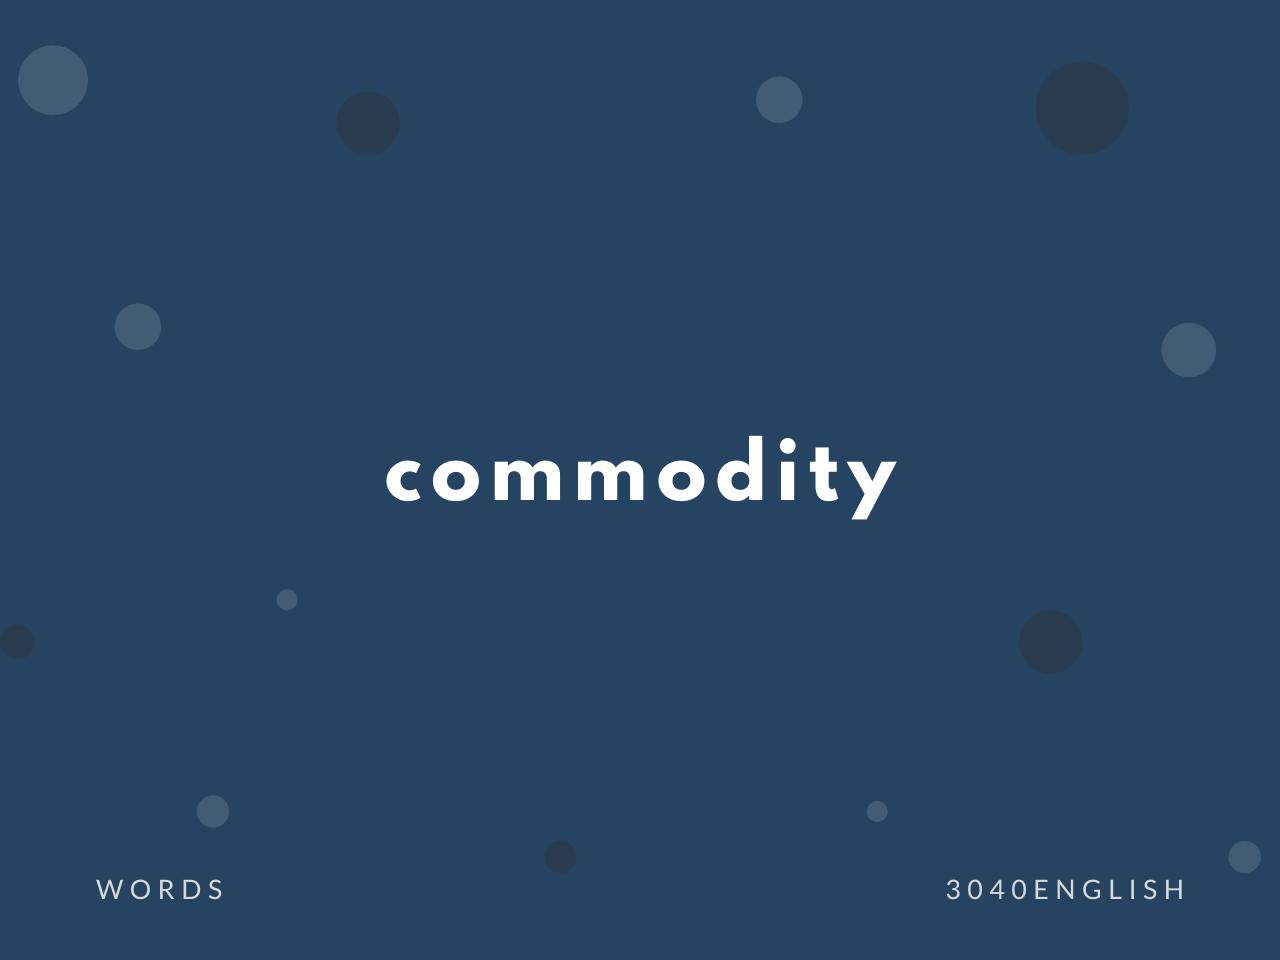 commodity の意味と簡単な使い方【音読用例文あり】